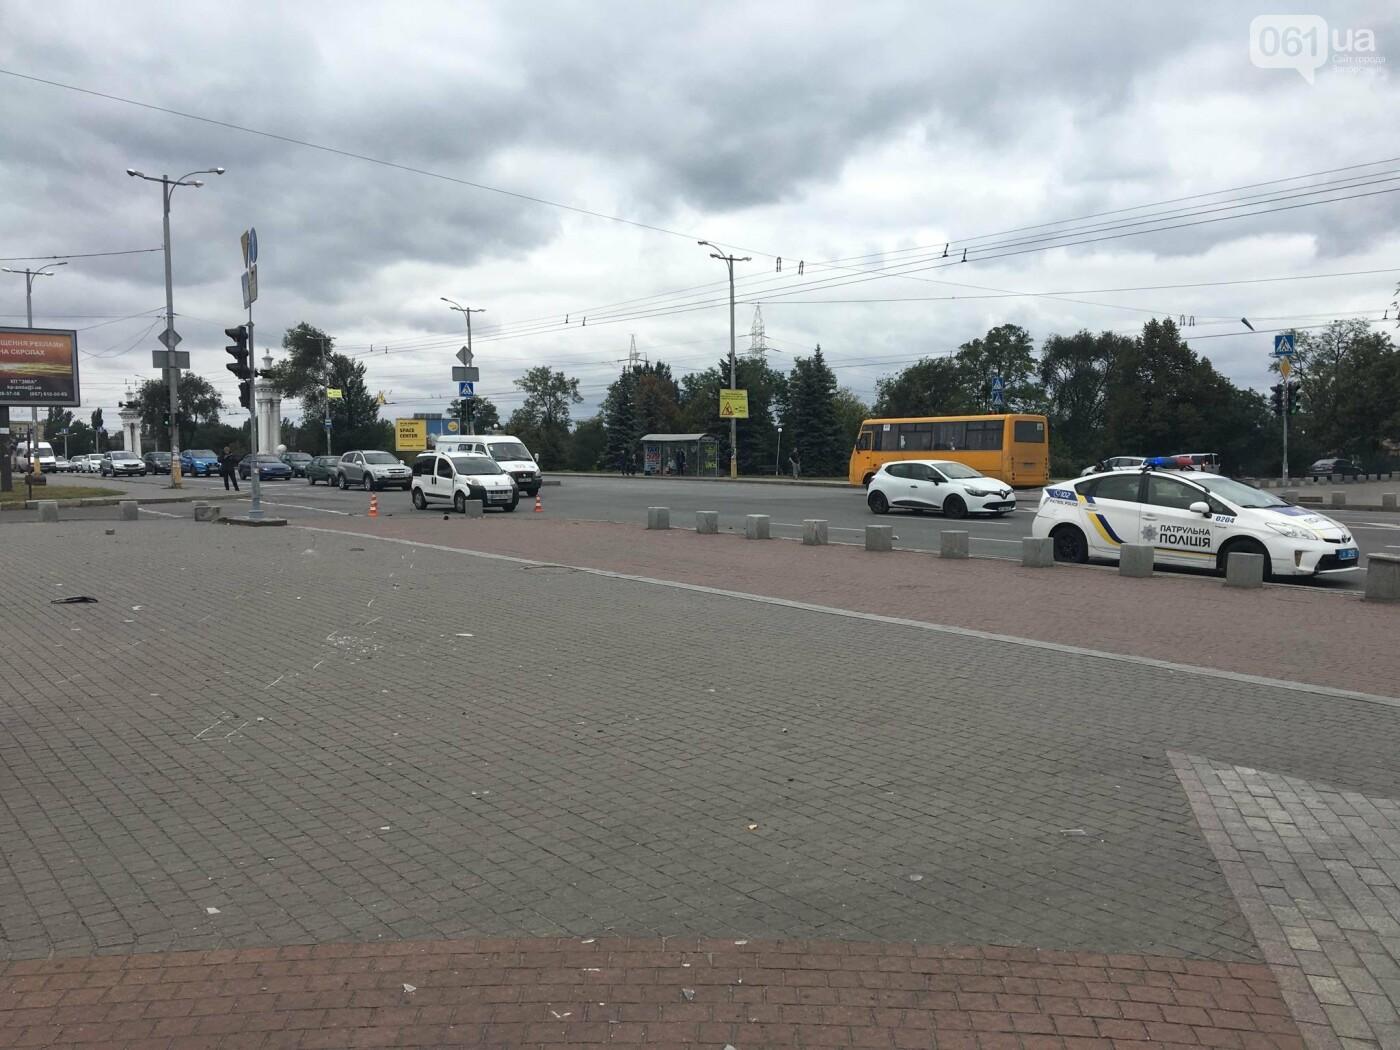 В центре Запорожья маршрутка попала в ДТП: пассажирку госпитализировали, - ФОТО, ВИДЕО, фото-3